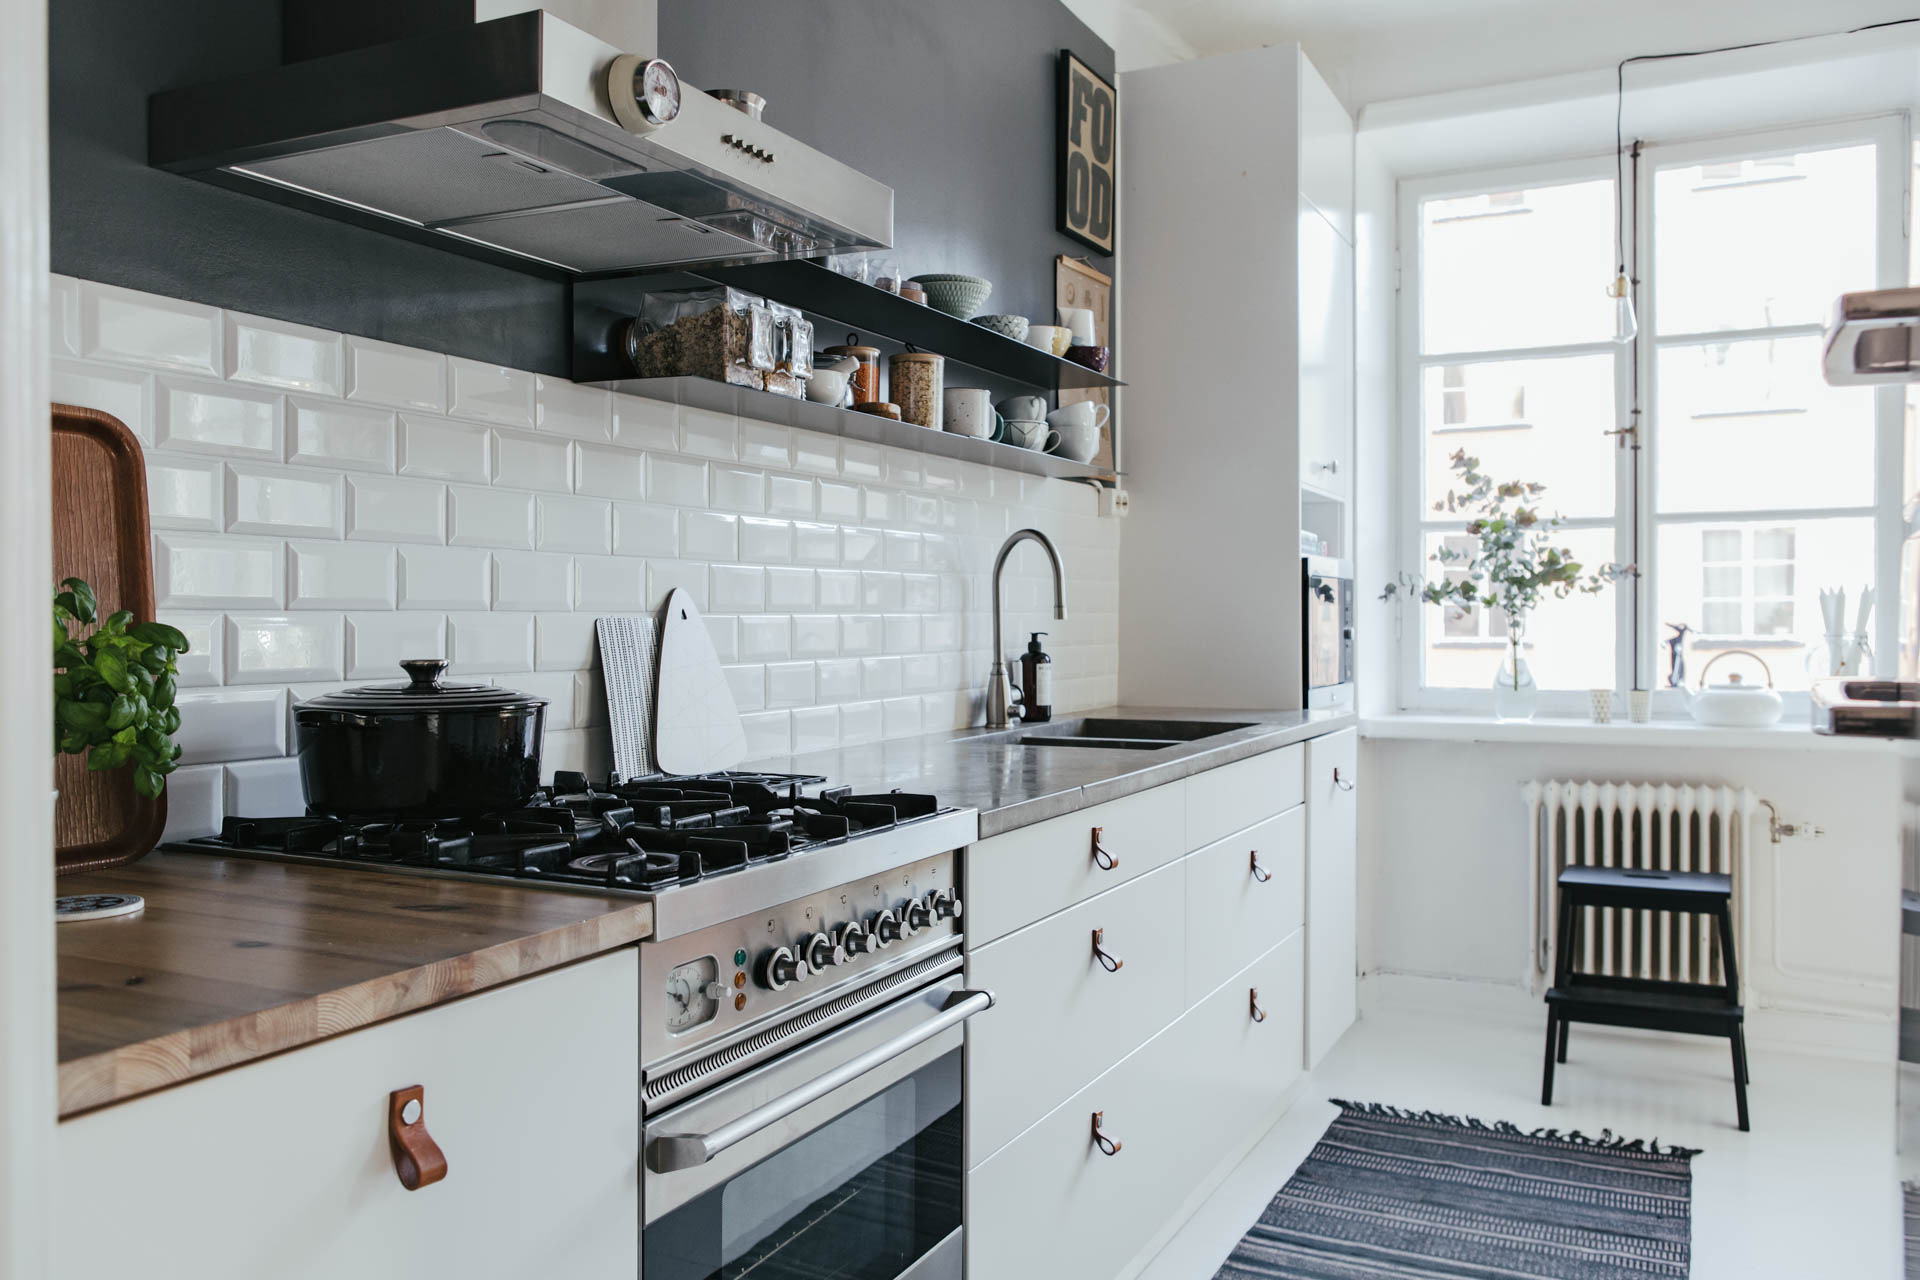 Cocinas interiores chic blog de decoraci n n rdica - Azulejos para cocina modernos ...